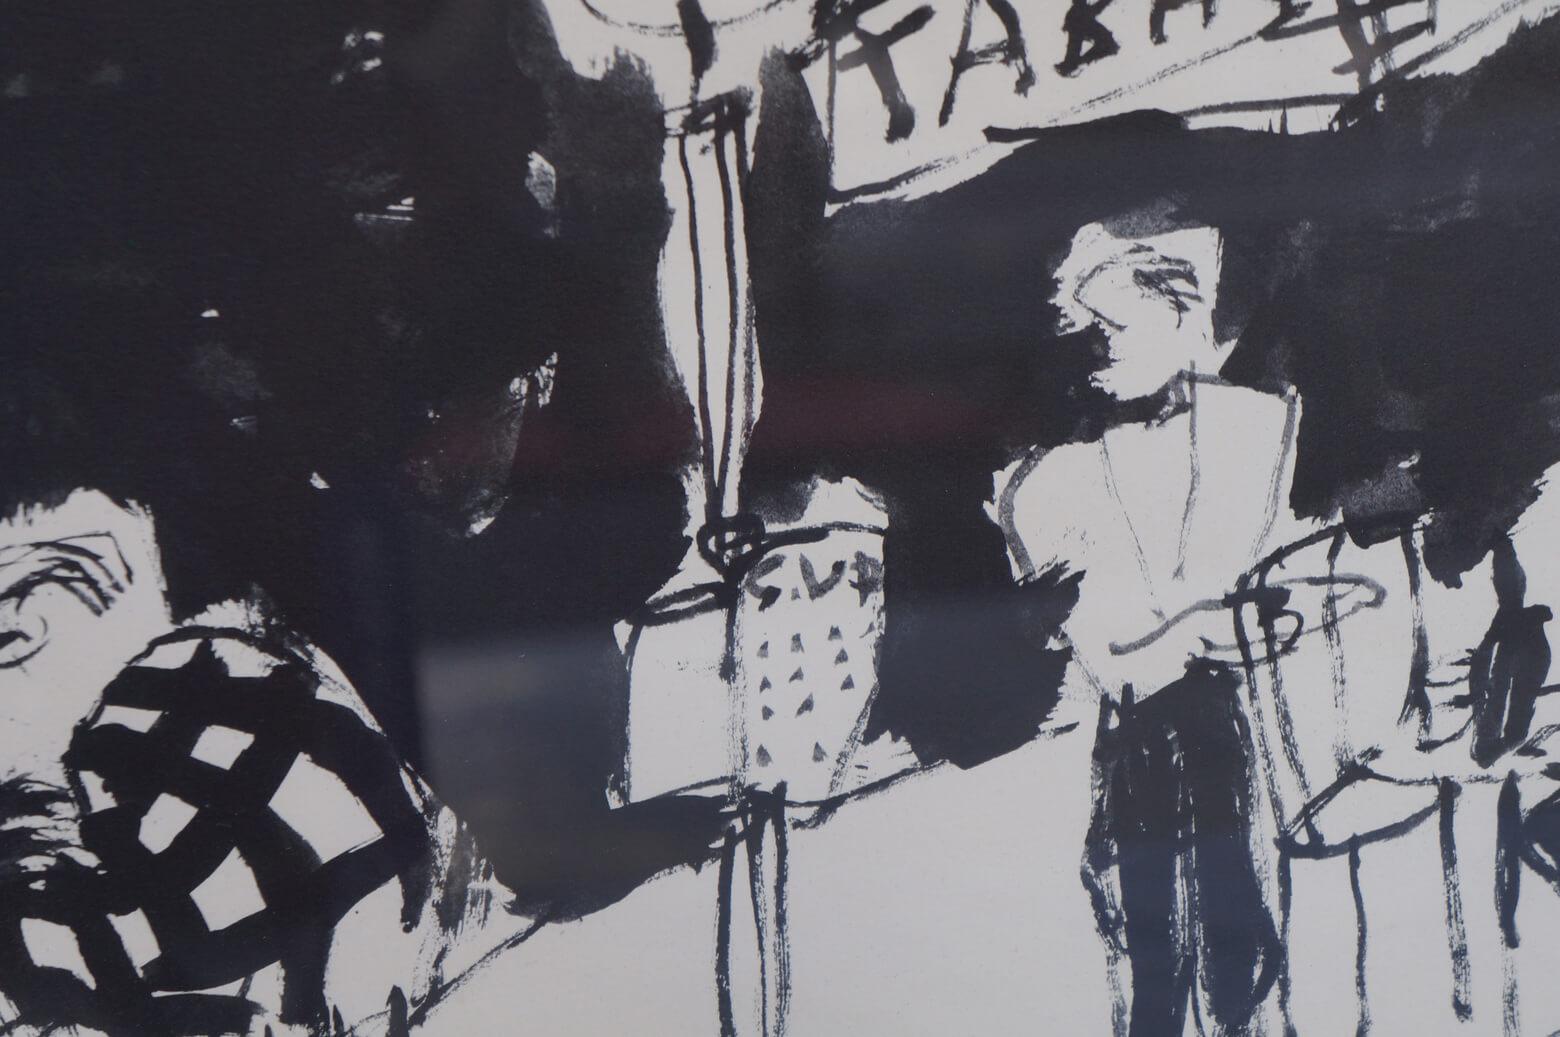 Shiguejiro Sano Lithograph/佐野繁次郎 リトグラフ 「パリの四季・秋」